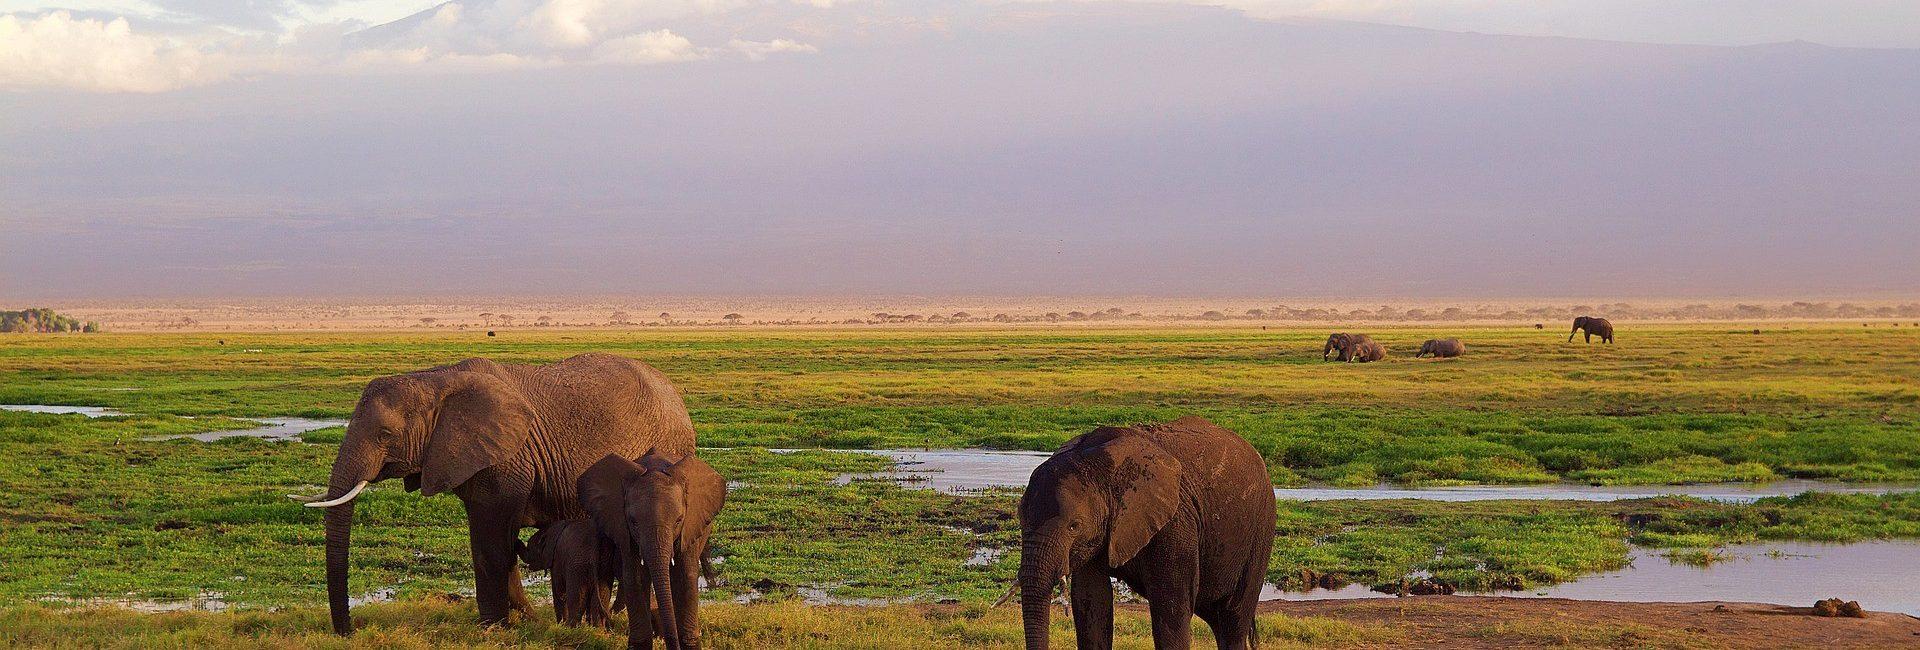 safari-cudesni-svijet-maasaija-9021bcd5-8945-4fa2-8749-17bb28d79ace